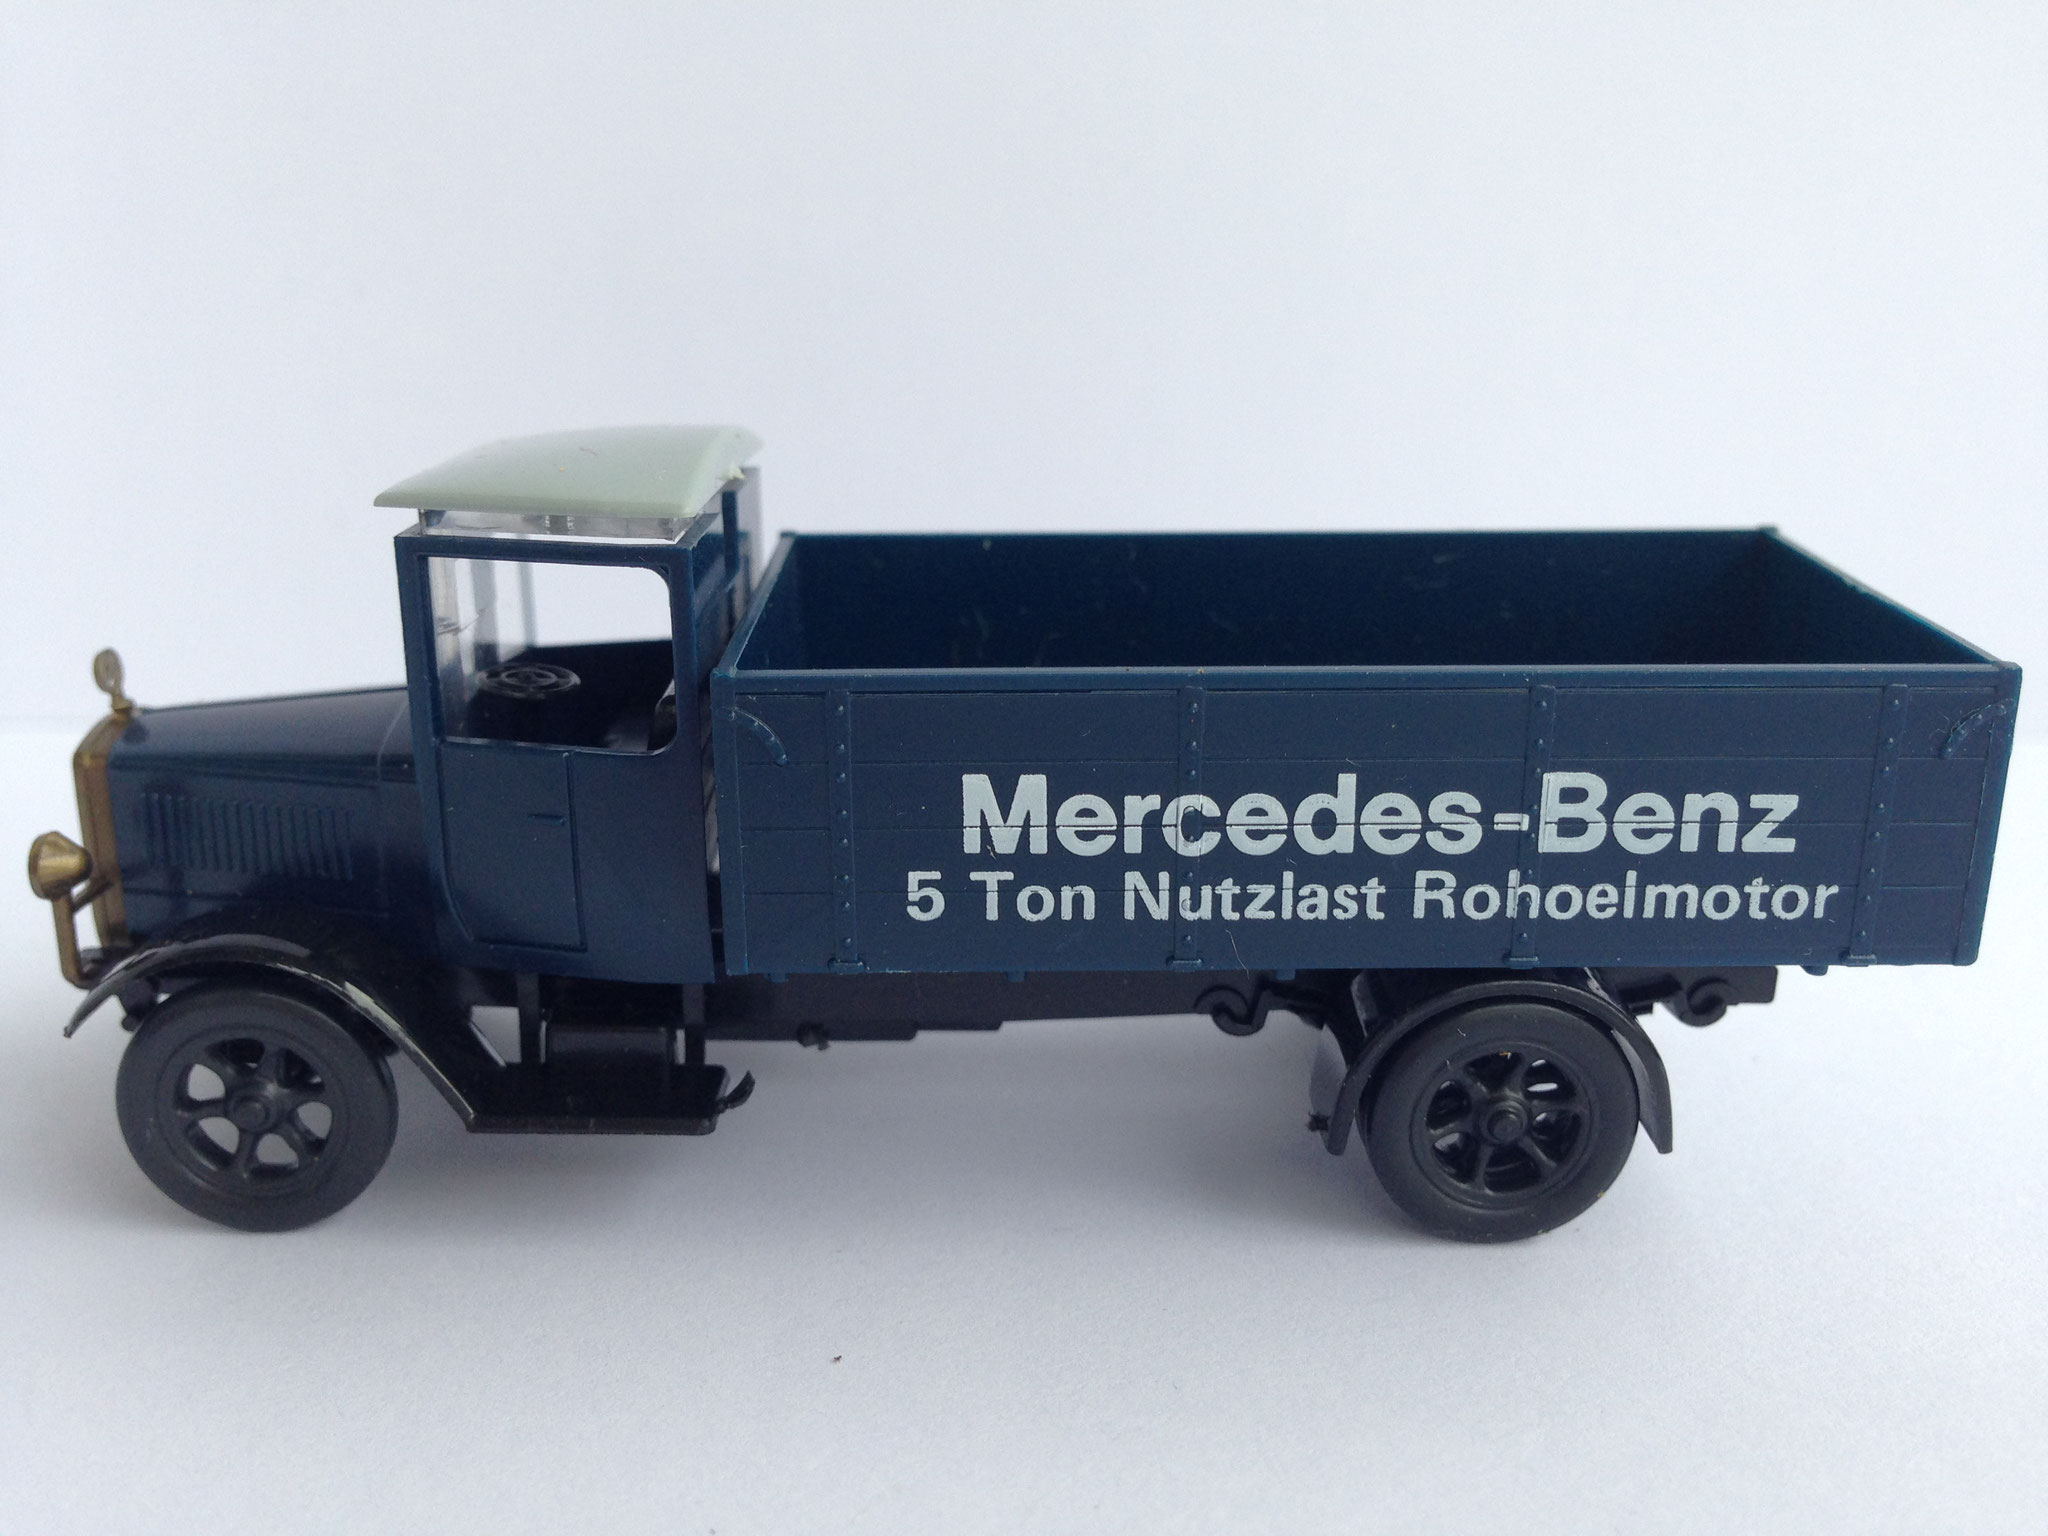 Mercedes L5 Mercedes-Benz 5 Ton Nutzlast Rohoelmotor (MB-Museum), 1990